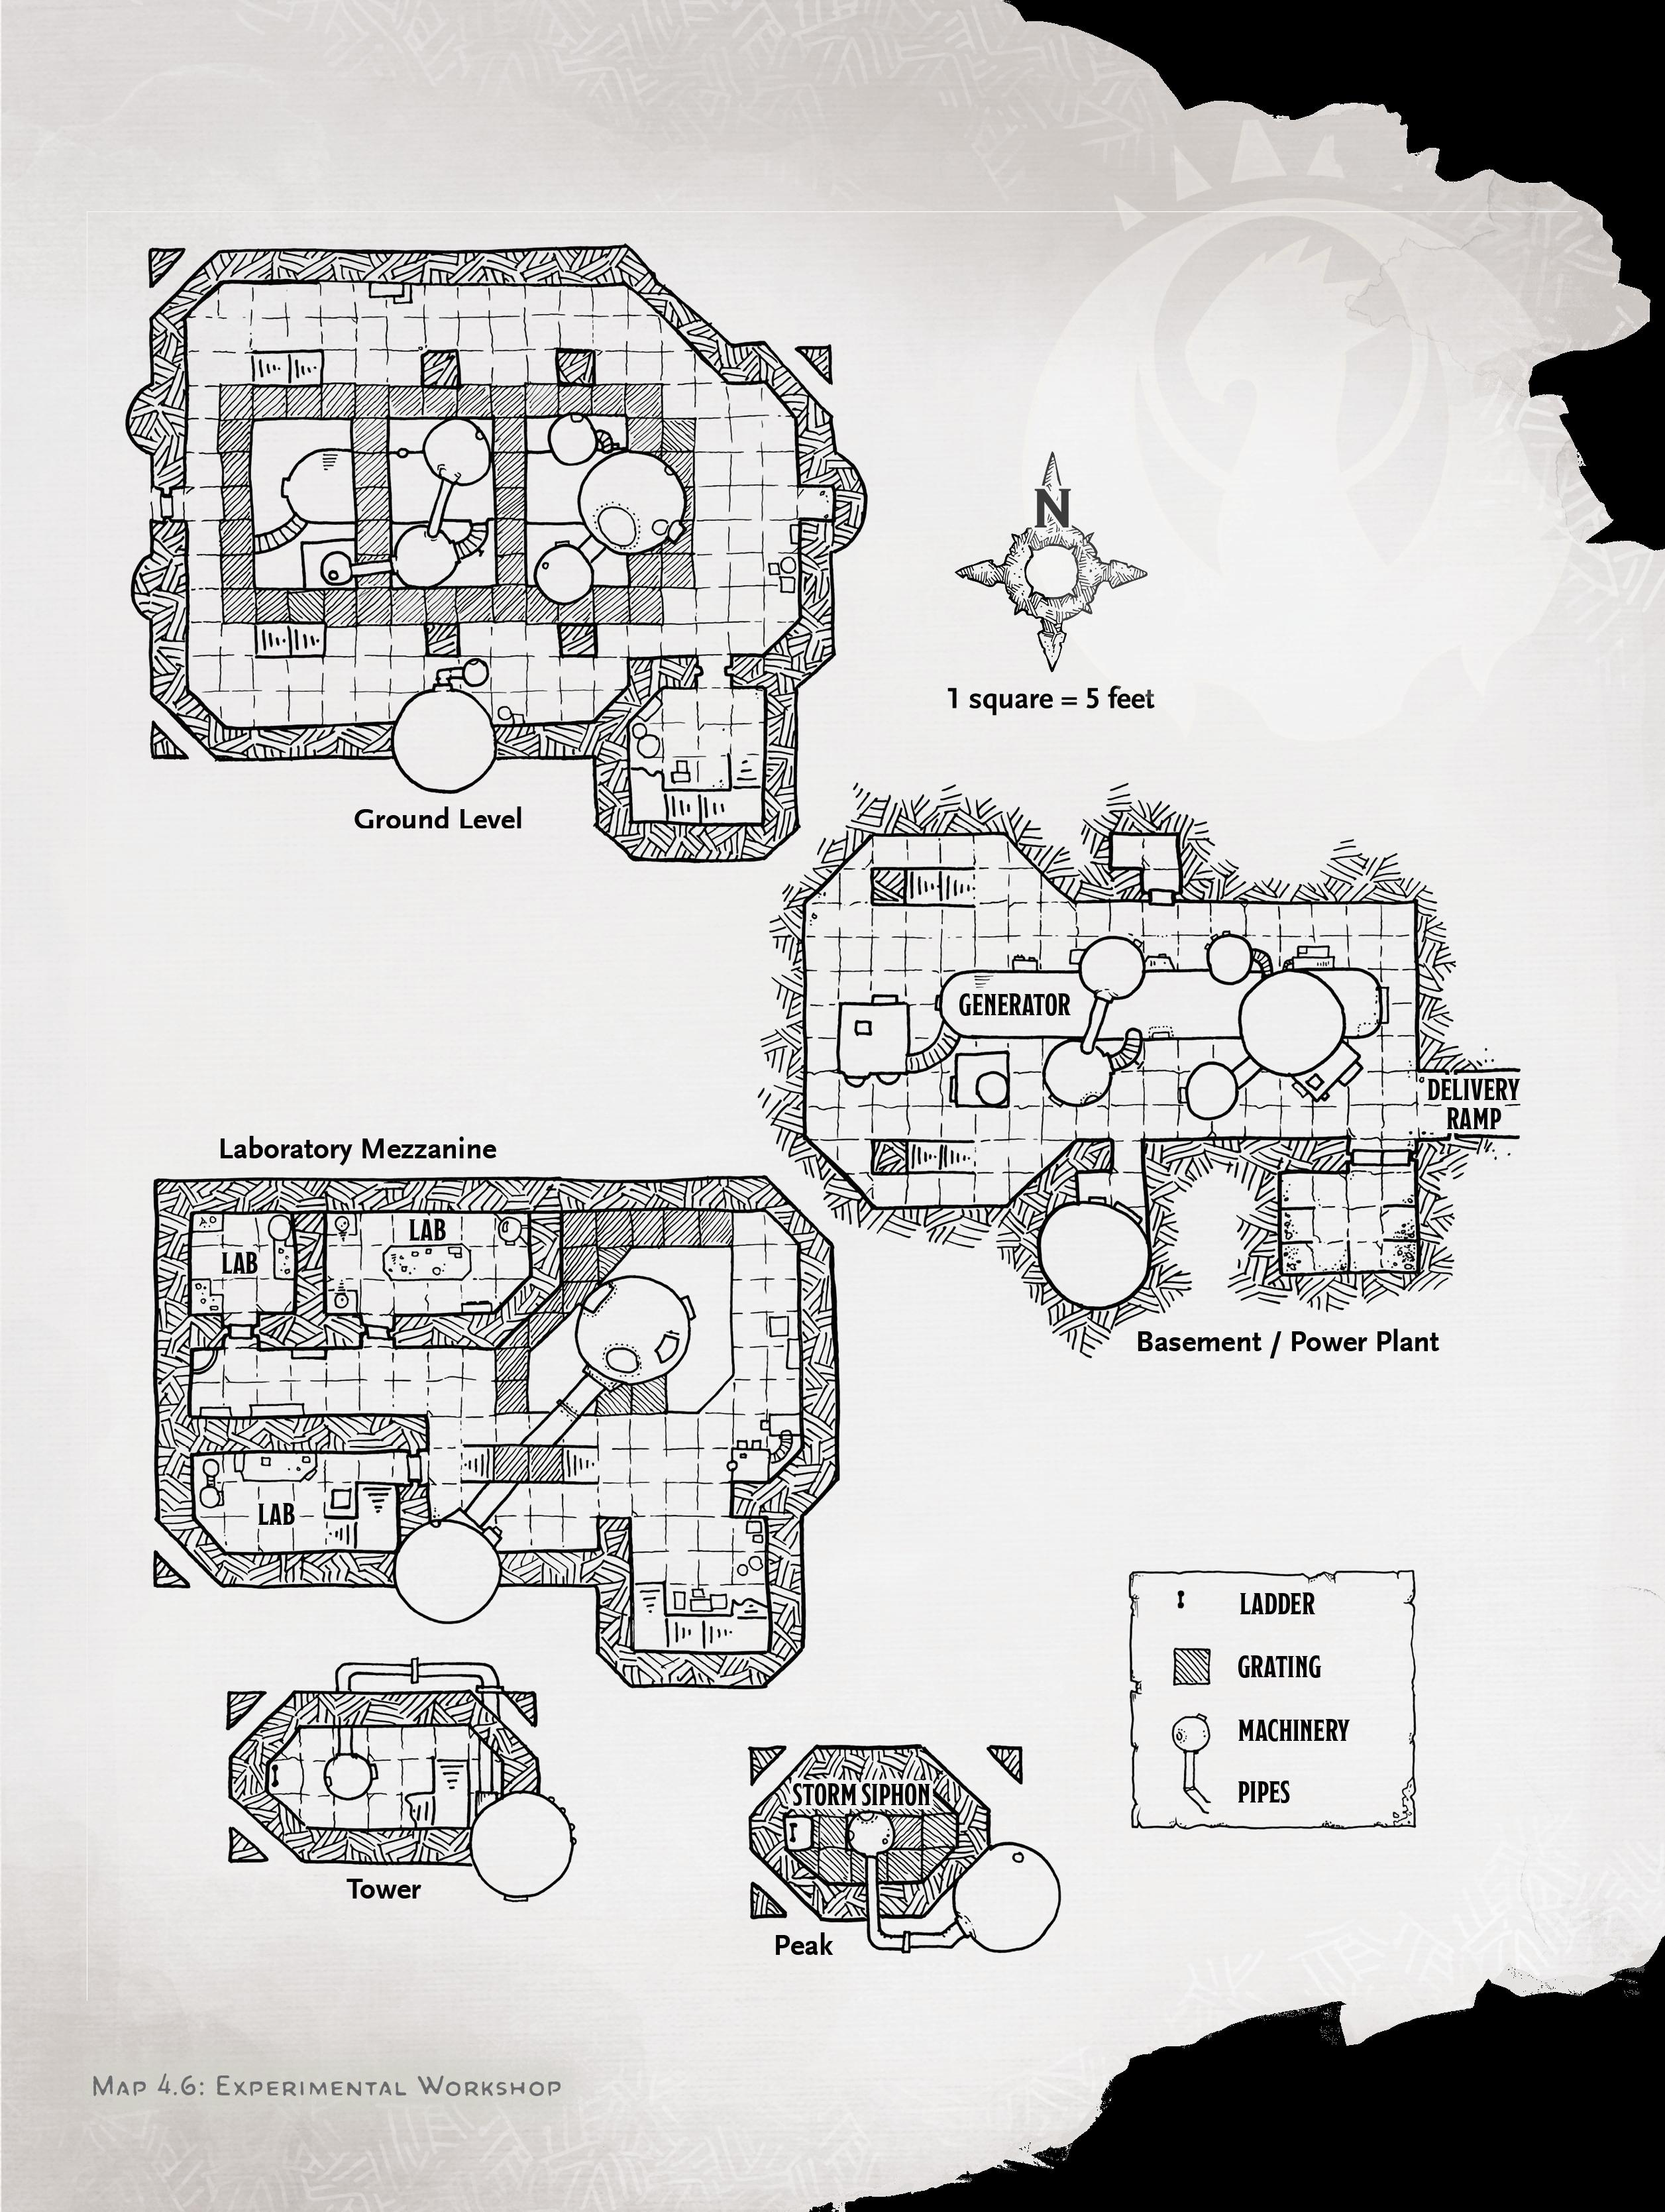 experimental workshop map